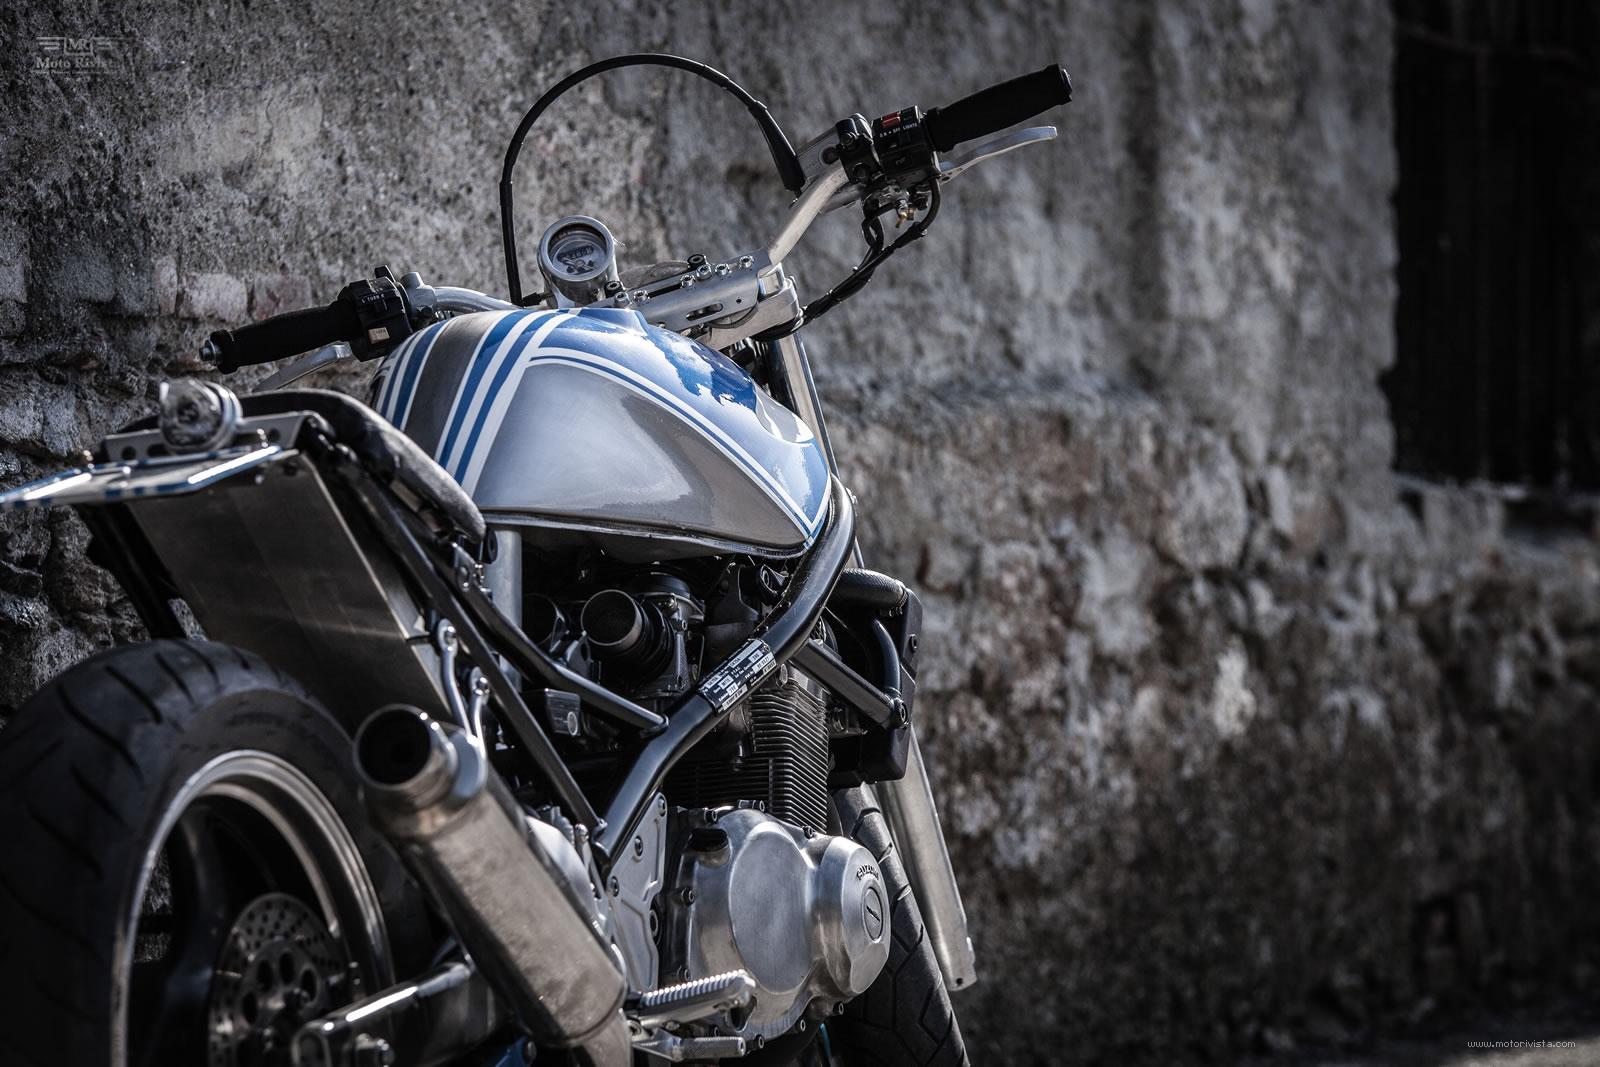 Bandits raras vistas por ahí (web) Italian-custom-Suzuki-GSF400-7